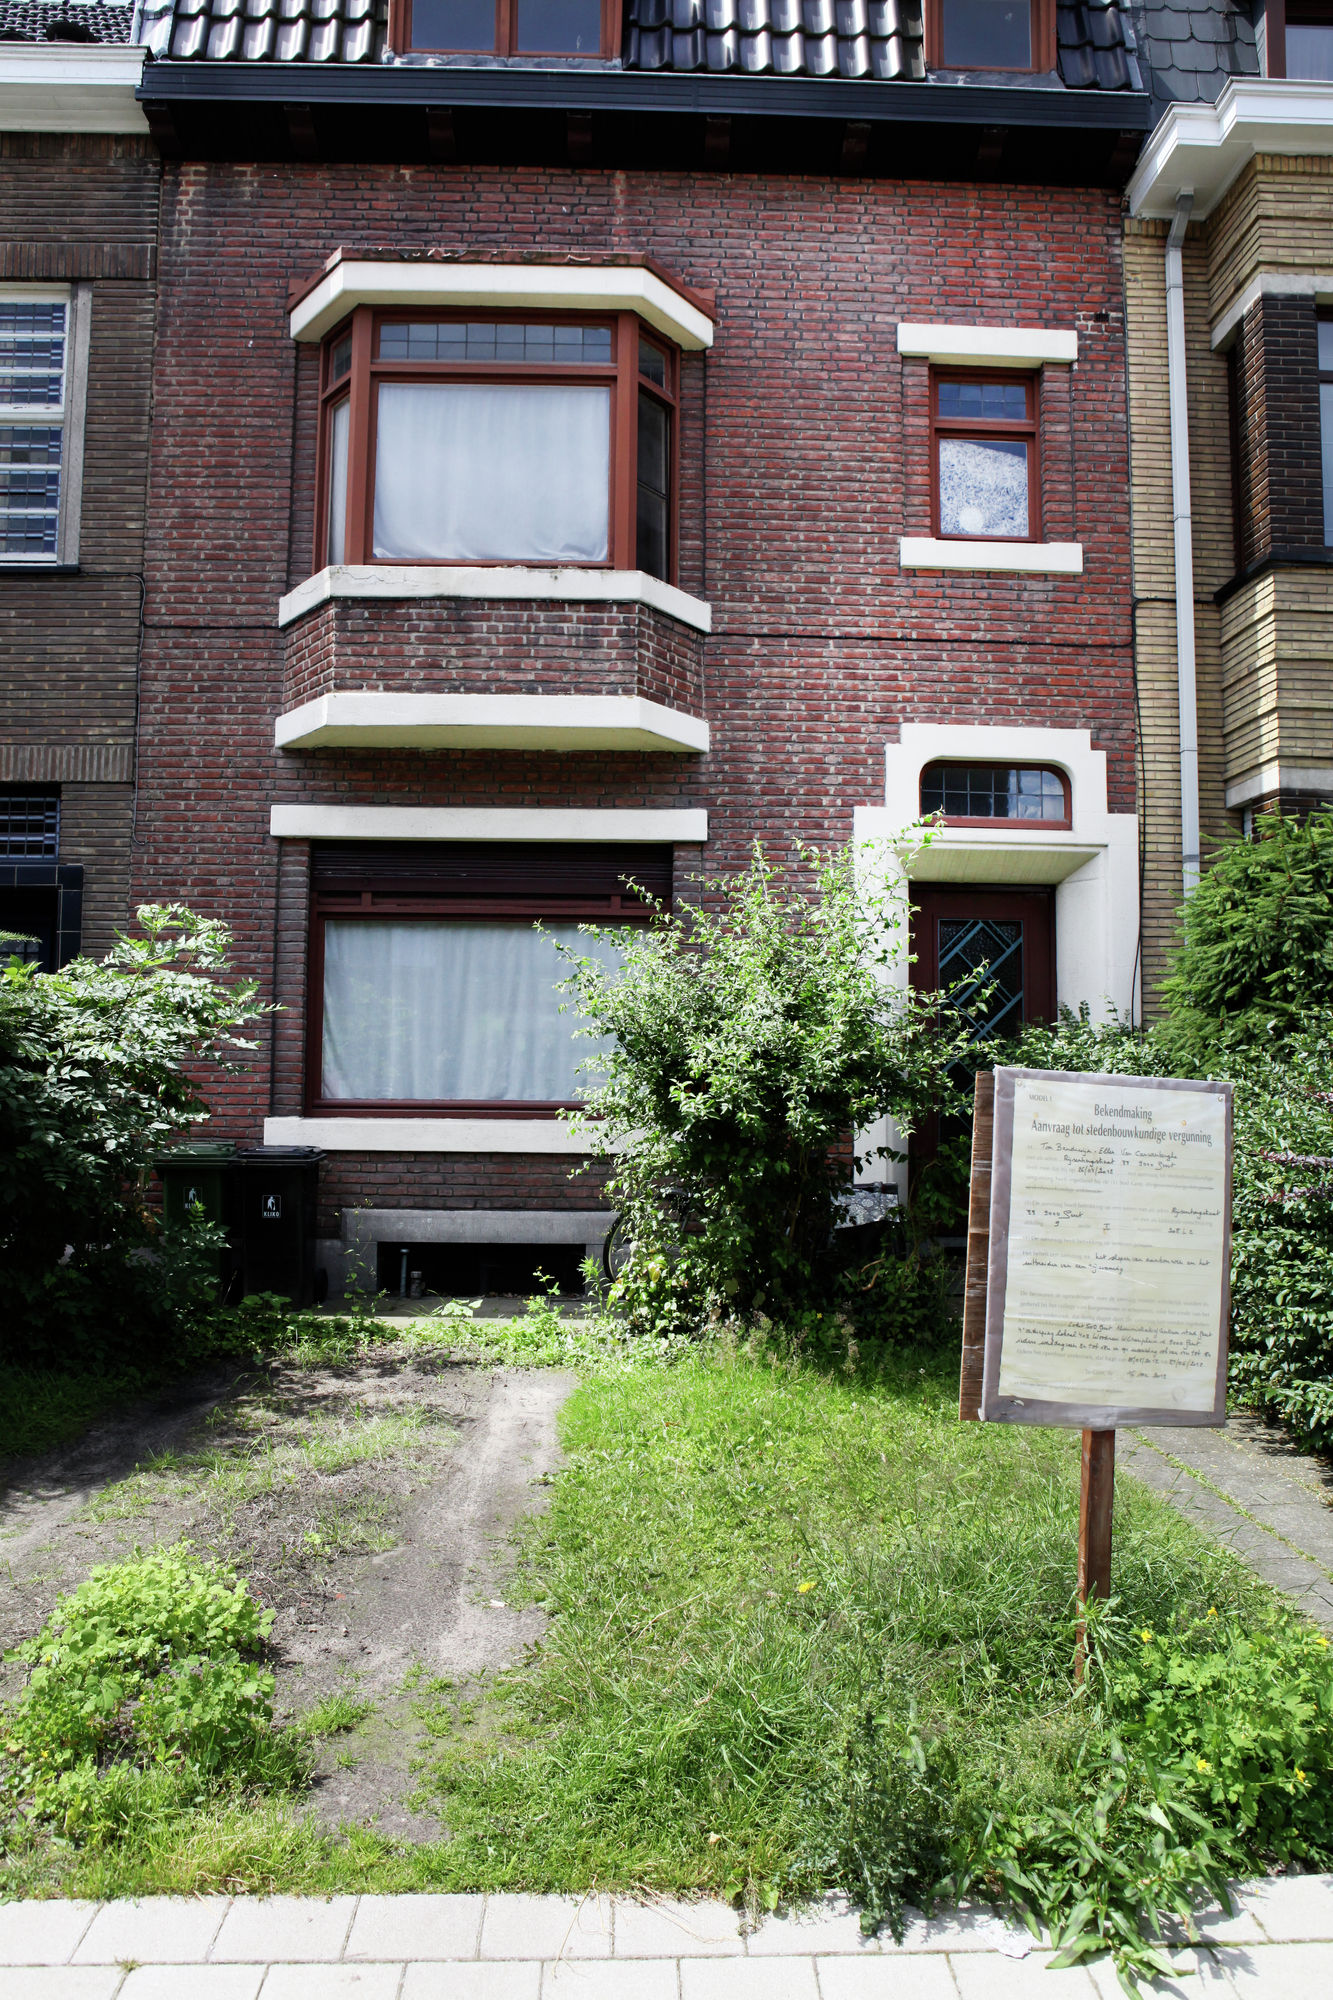 patijntjesstraat voortuintjes (5)©Layla Aerts.jpg